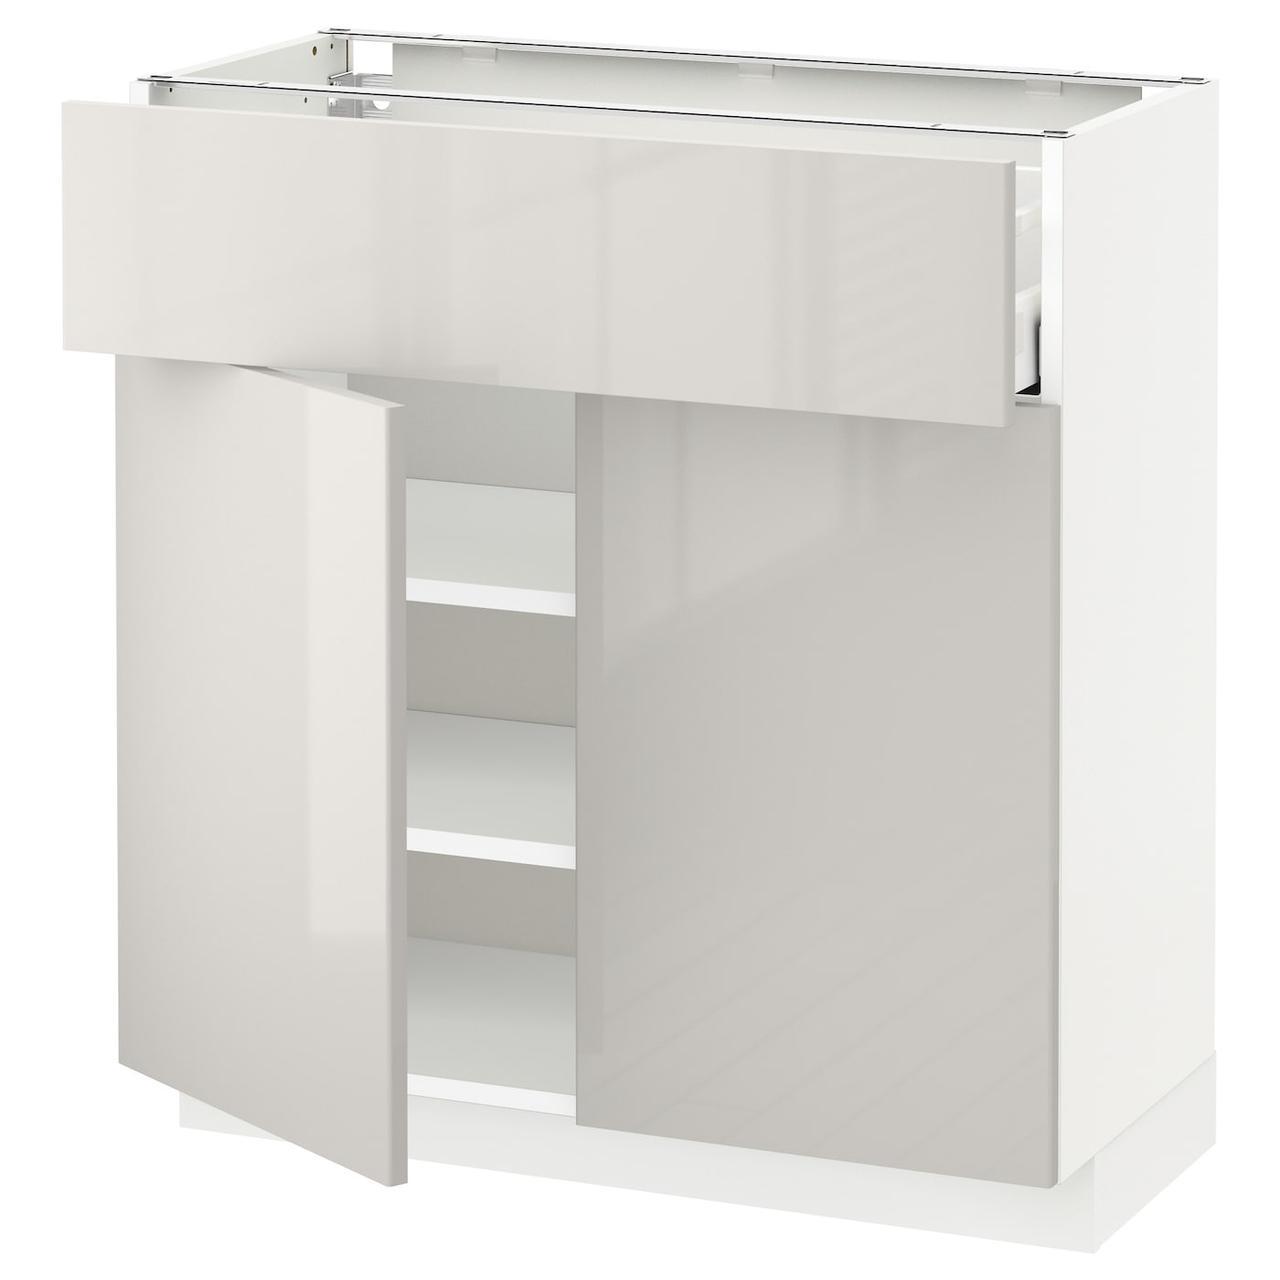 IKEA METOD / MAXIMERA (ІКЕА МЕТОДИ / MAXIMERA) 39369412